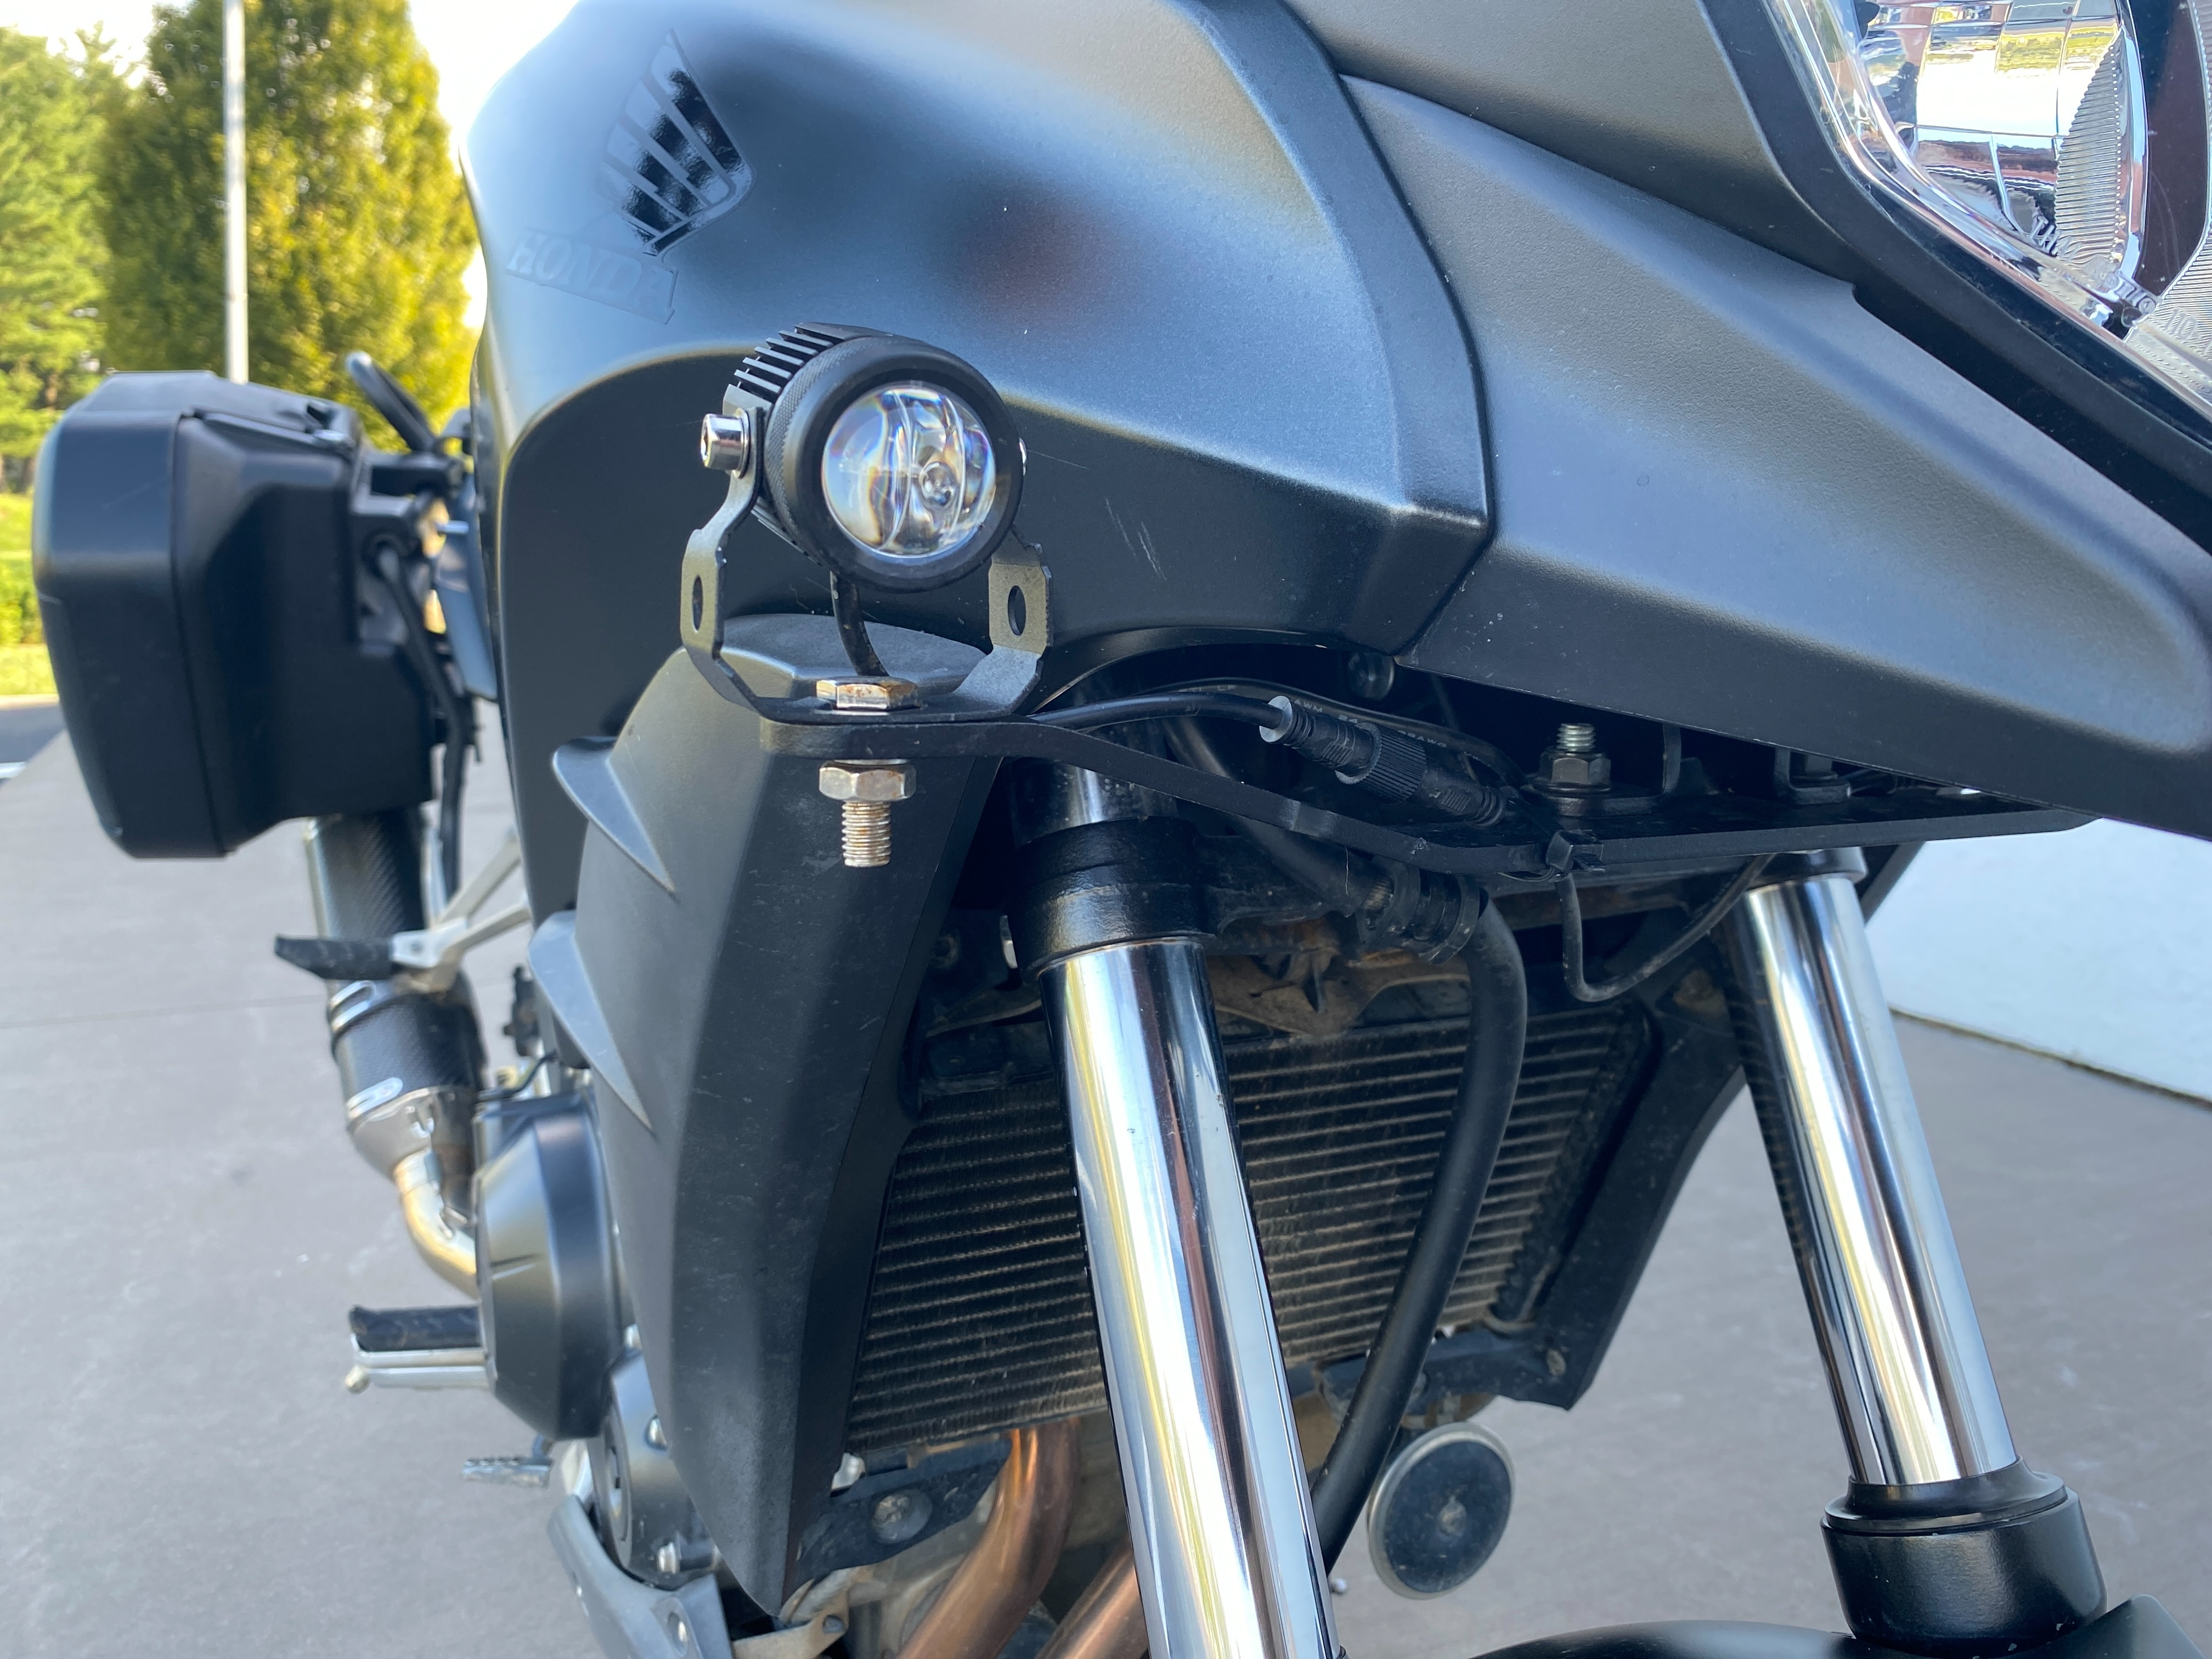 2015 Honda CB 500X at Frontline Eurosports